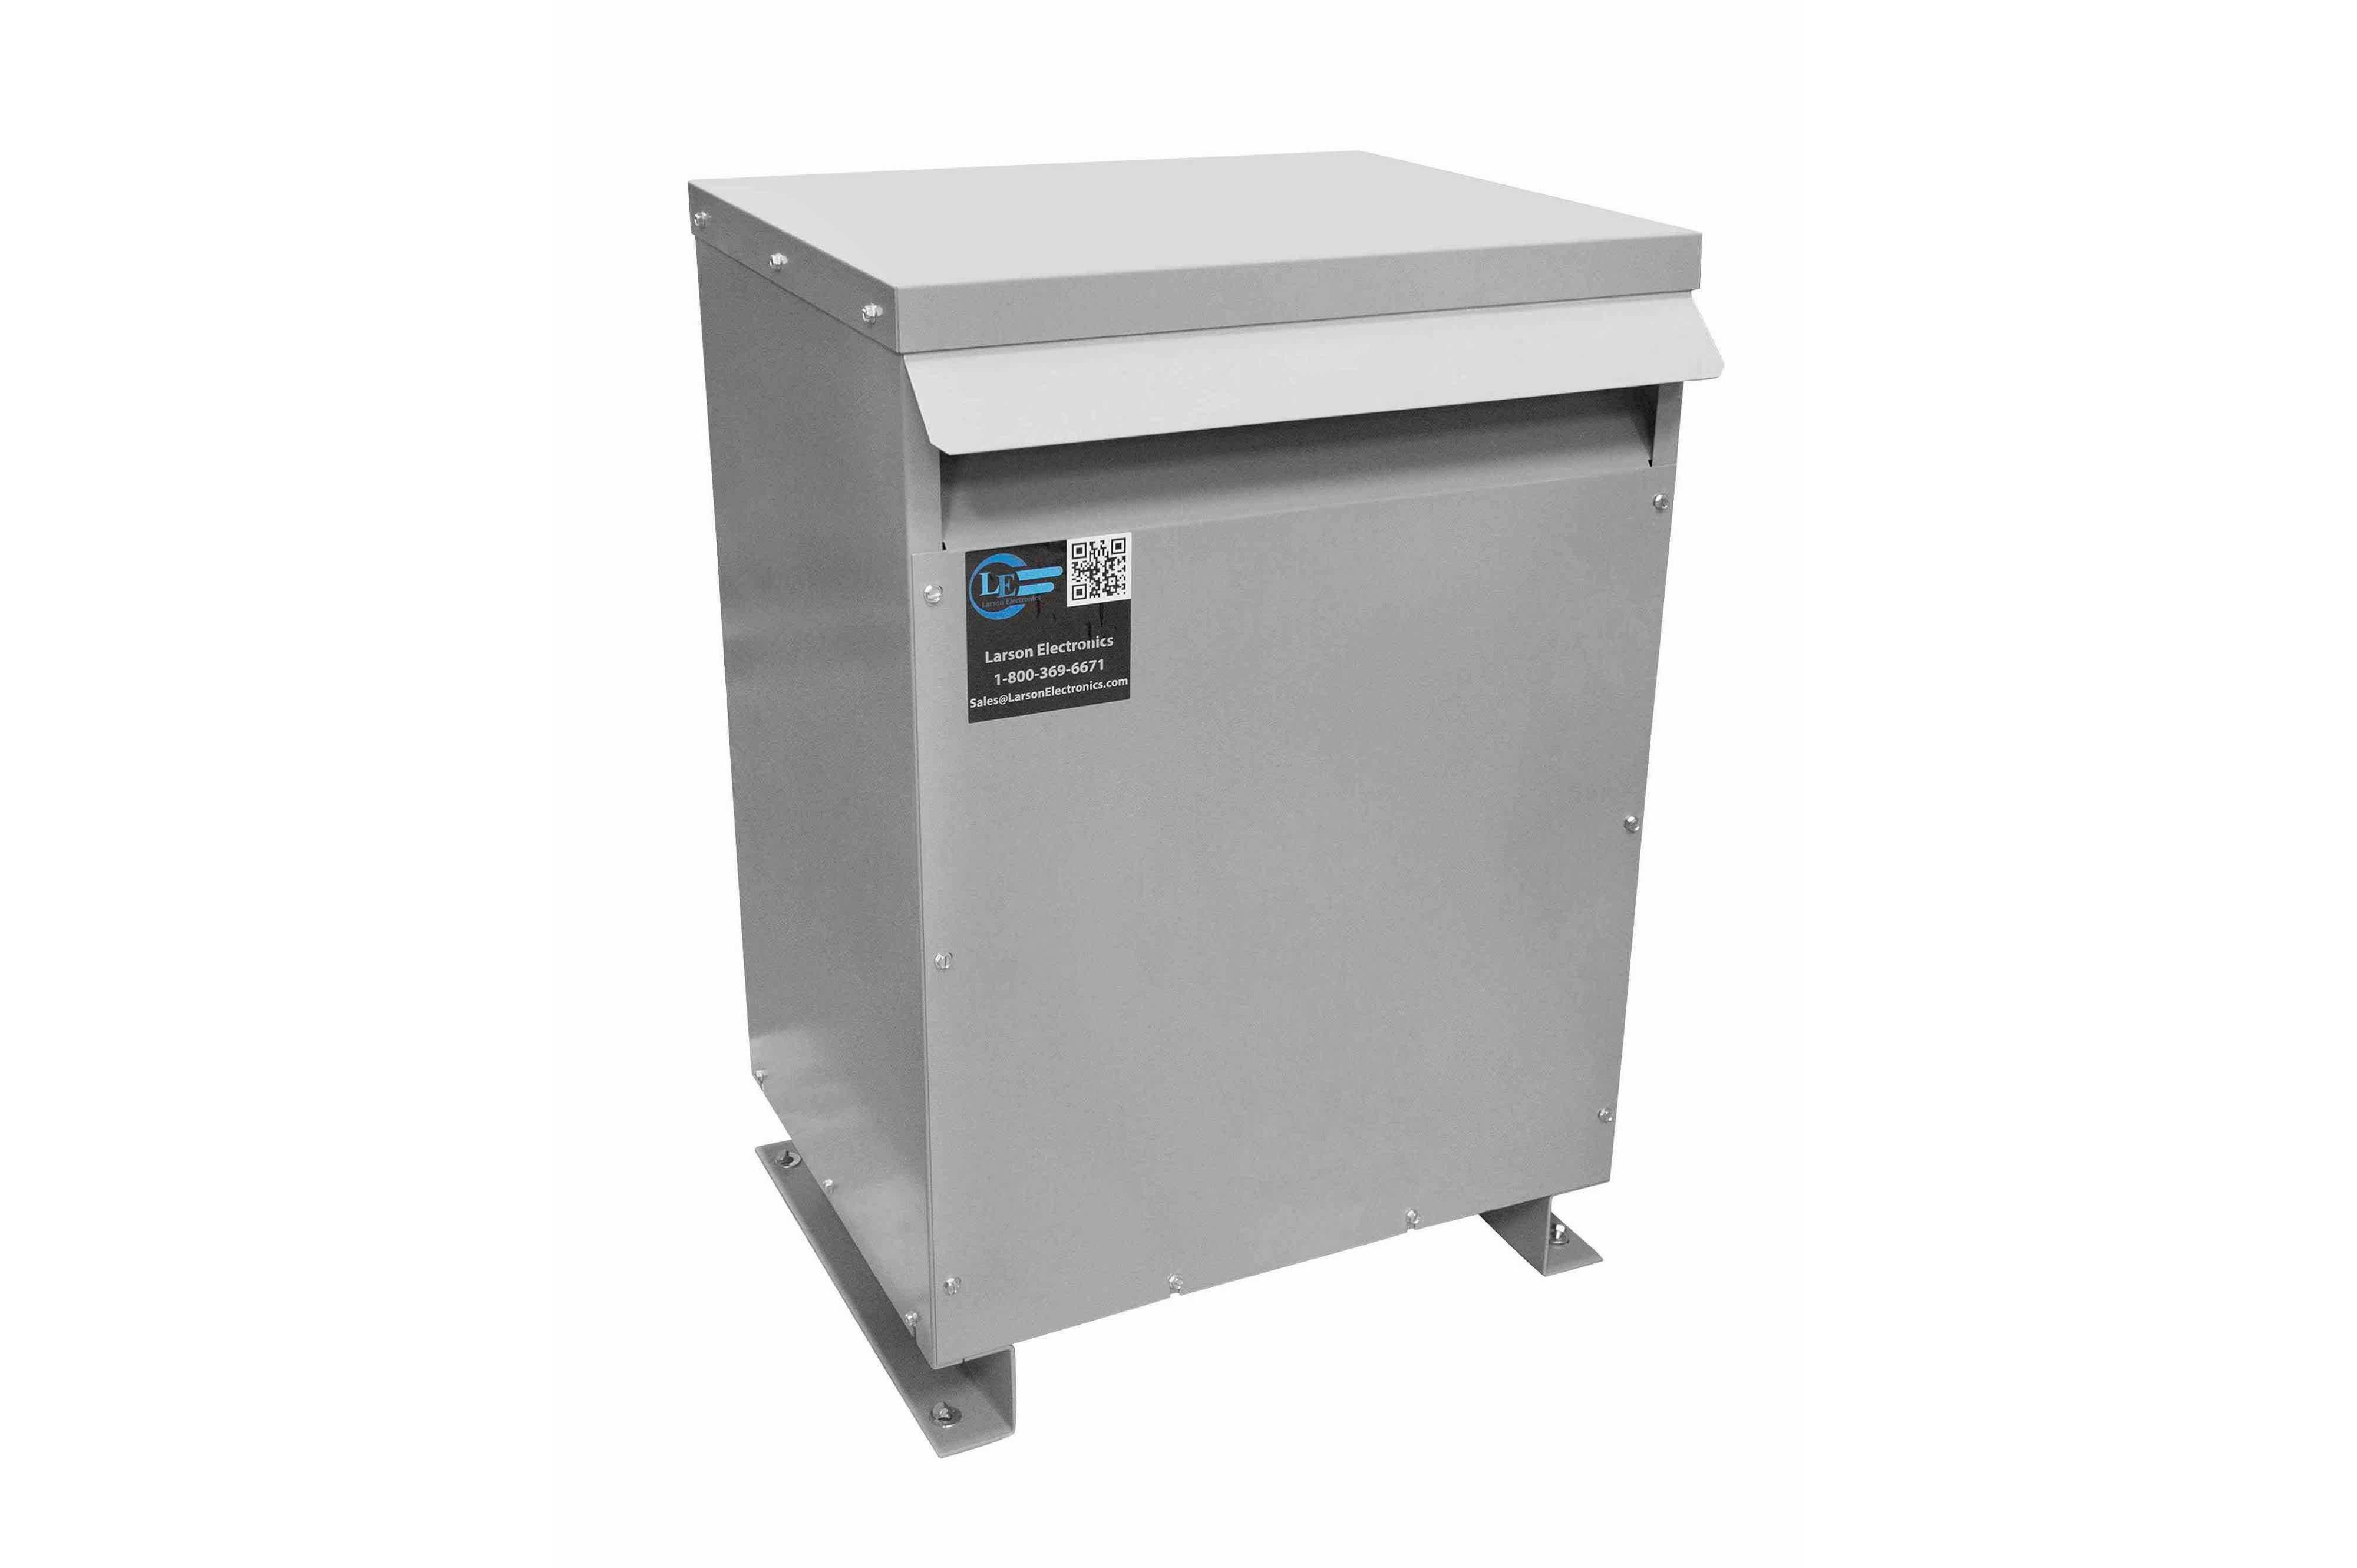 12 kVA 3PH Isolation Transformer, 208V Wye Primary, 380V Delta Secondary, N3R, Ventilated, 60 Hz